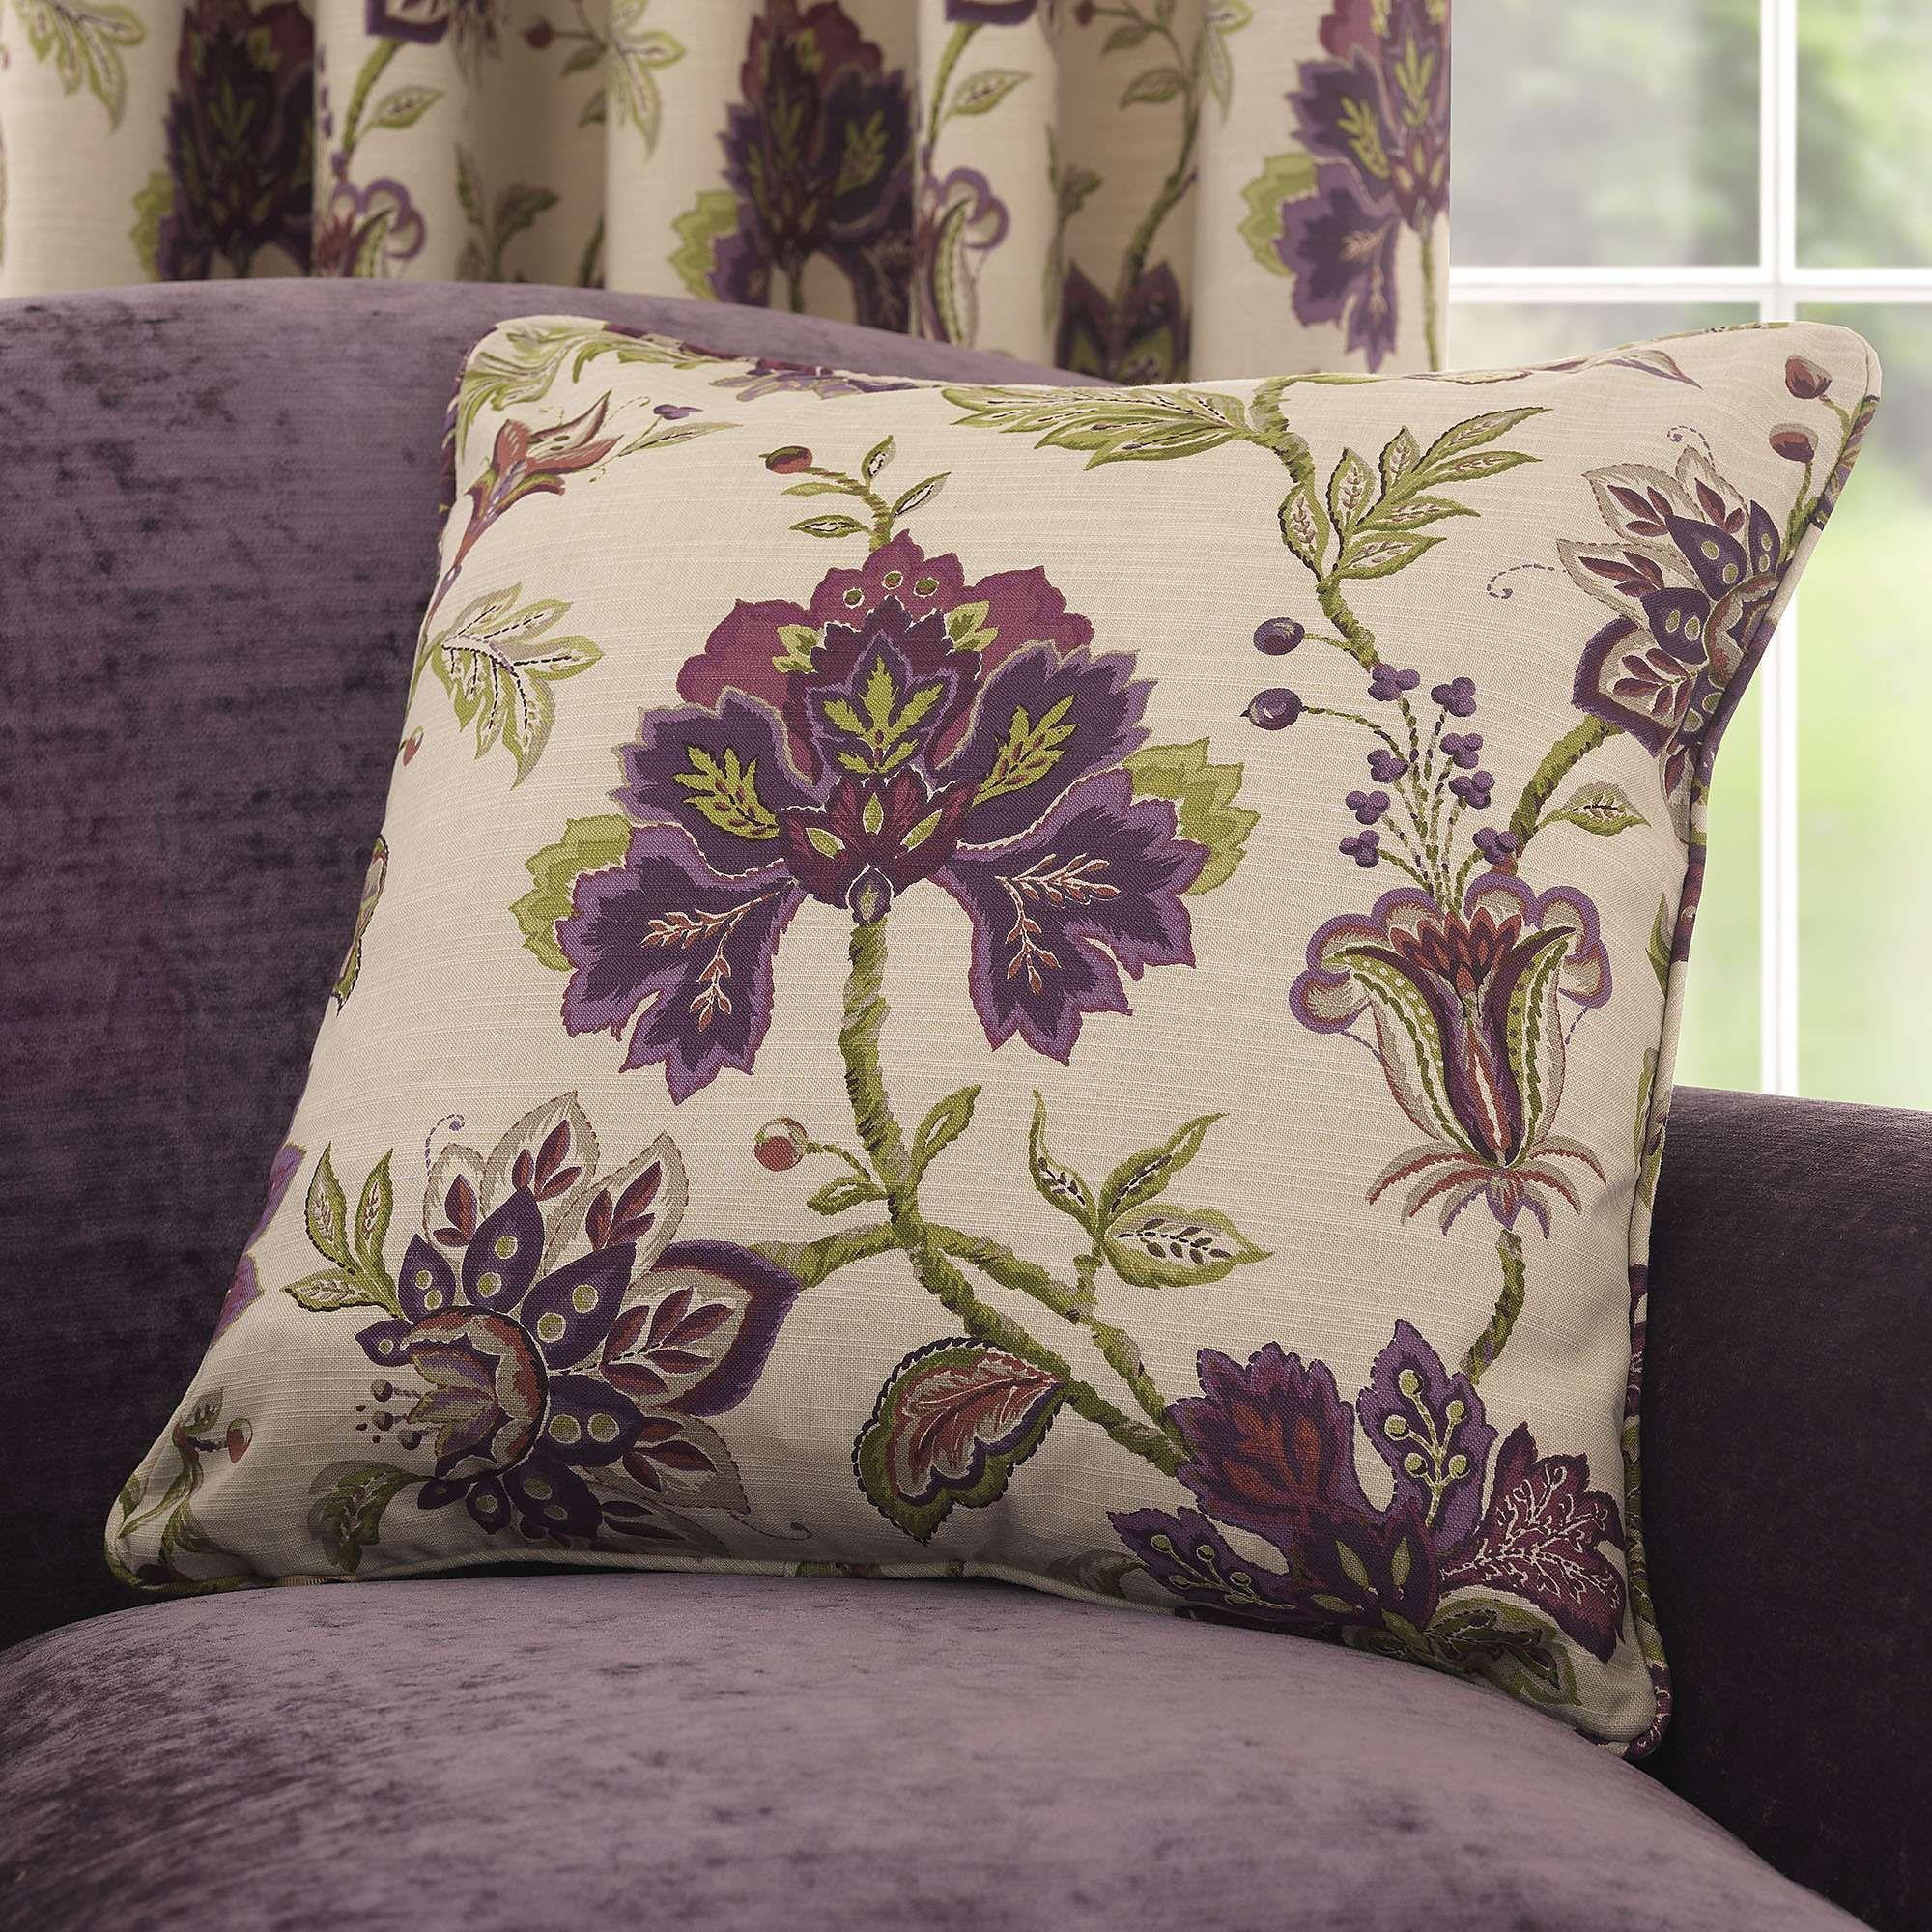 Dorma Bloomsbury Plum Lined Eyelet Curtains Dunelm Curtains Dunelm Lounge Decor Throw Pillows